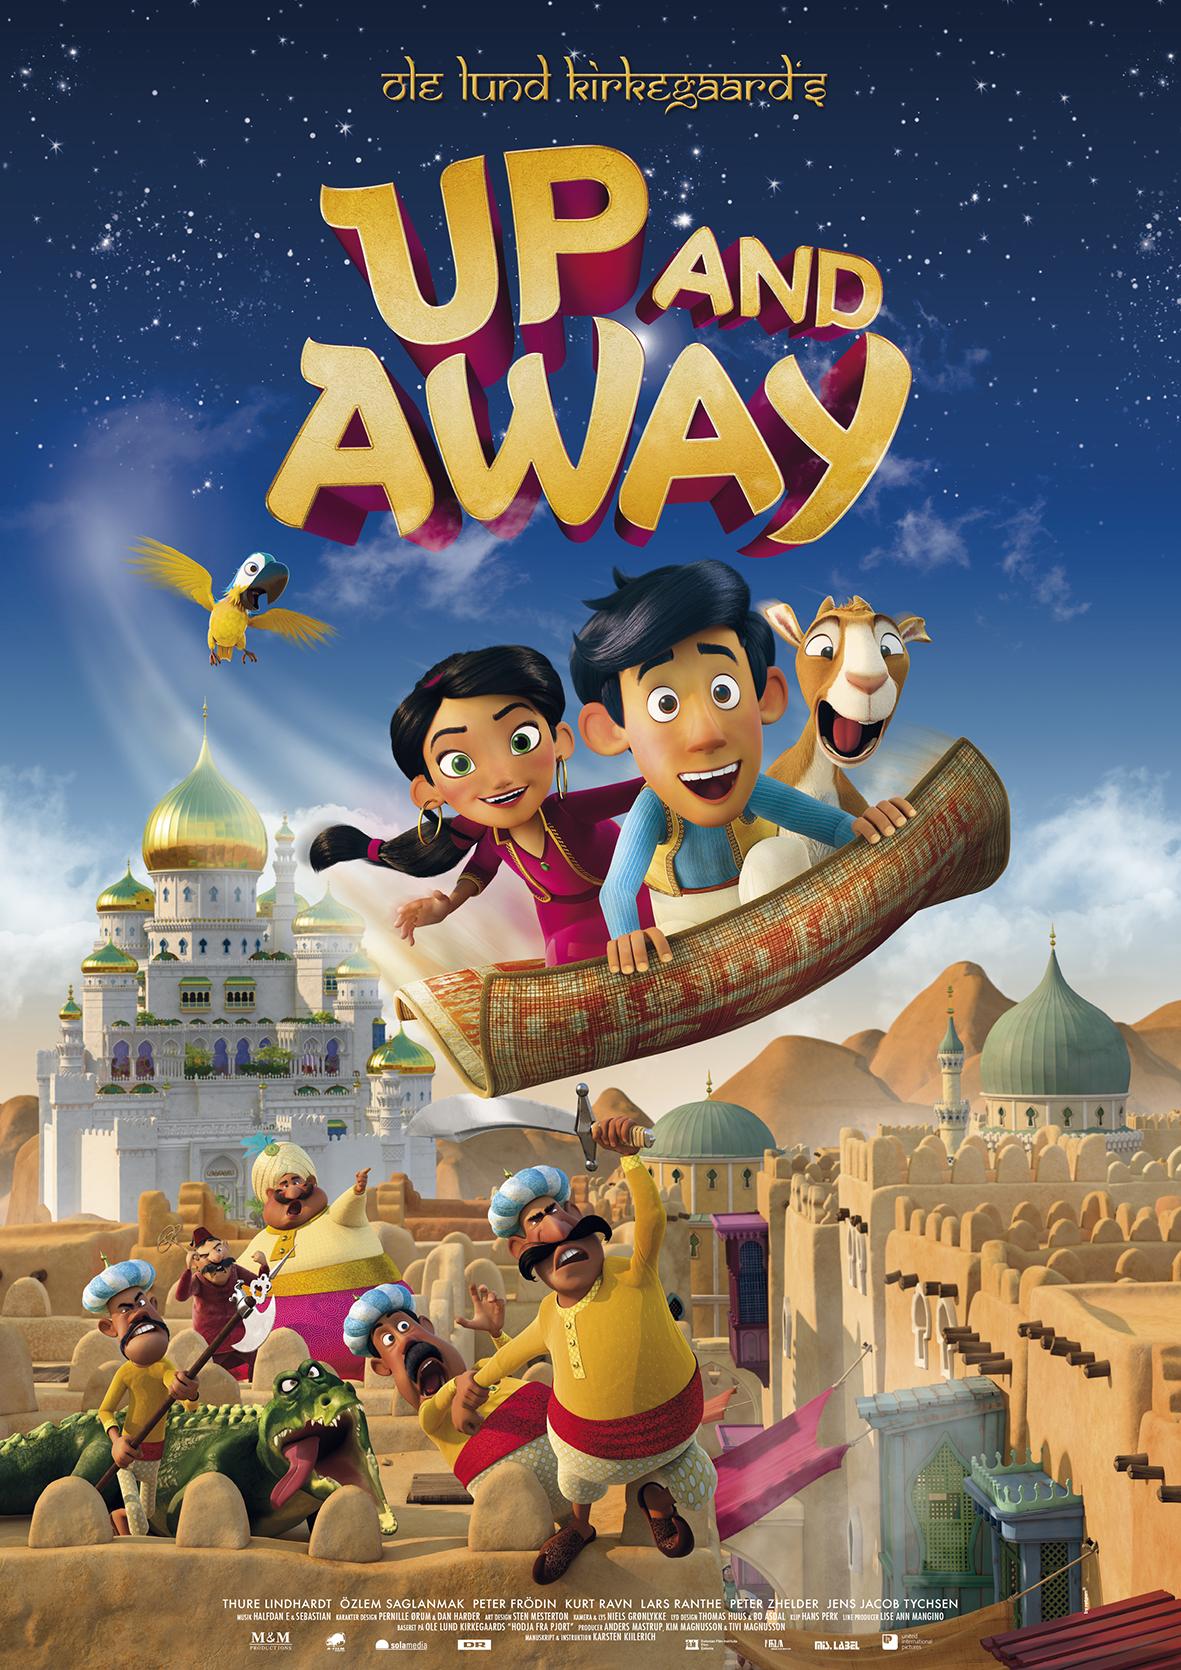 Up And Away 2018 Hindi ORG Dual Audio 480p, 720p, 1080p HDRip  Download